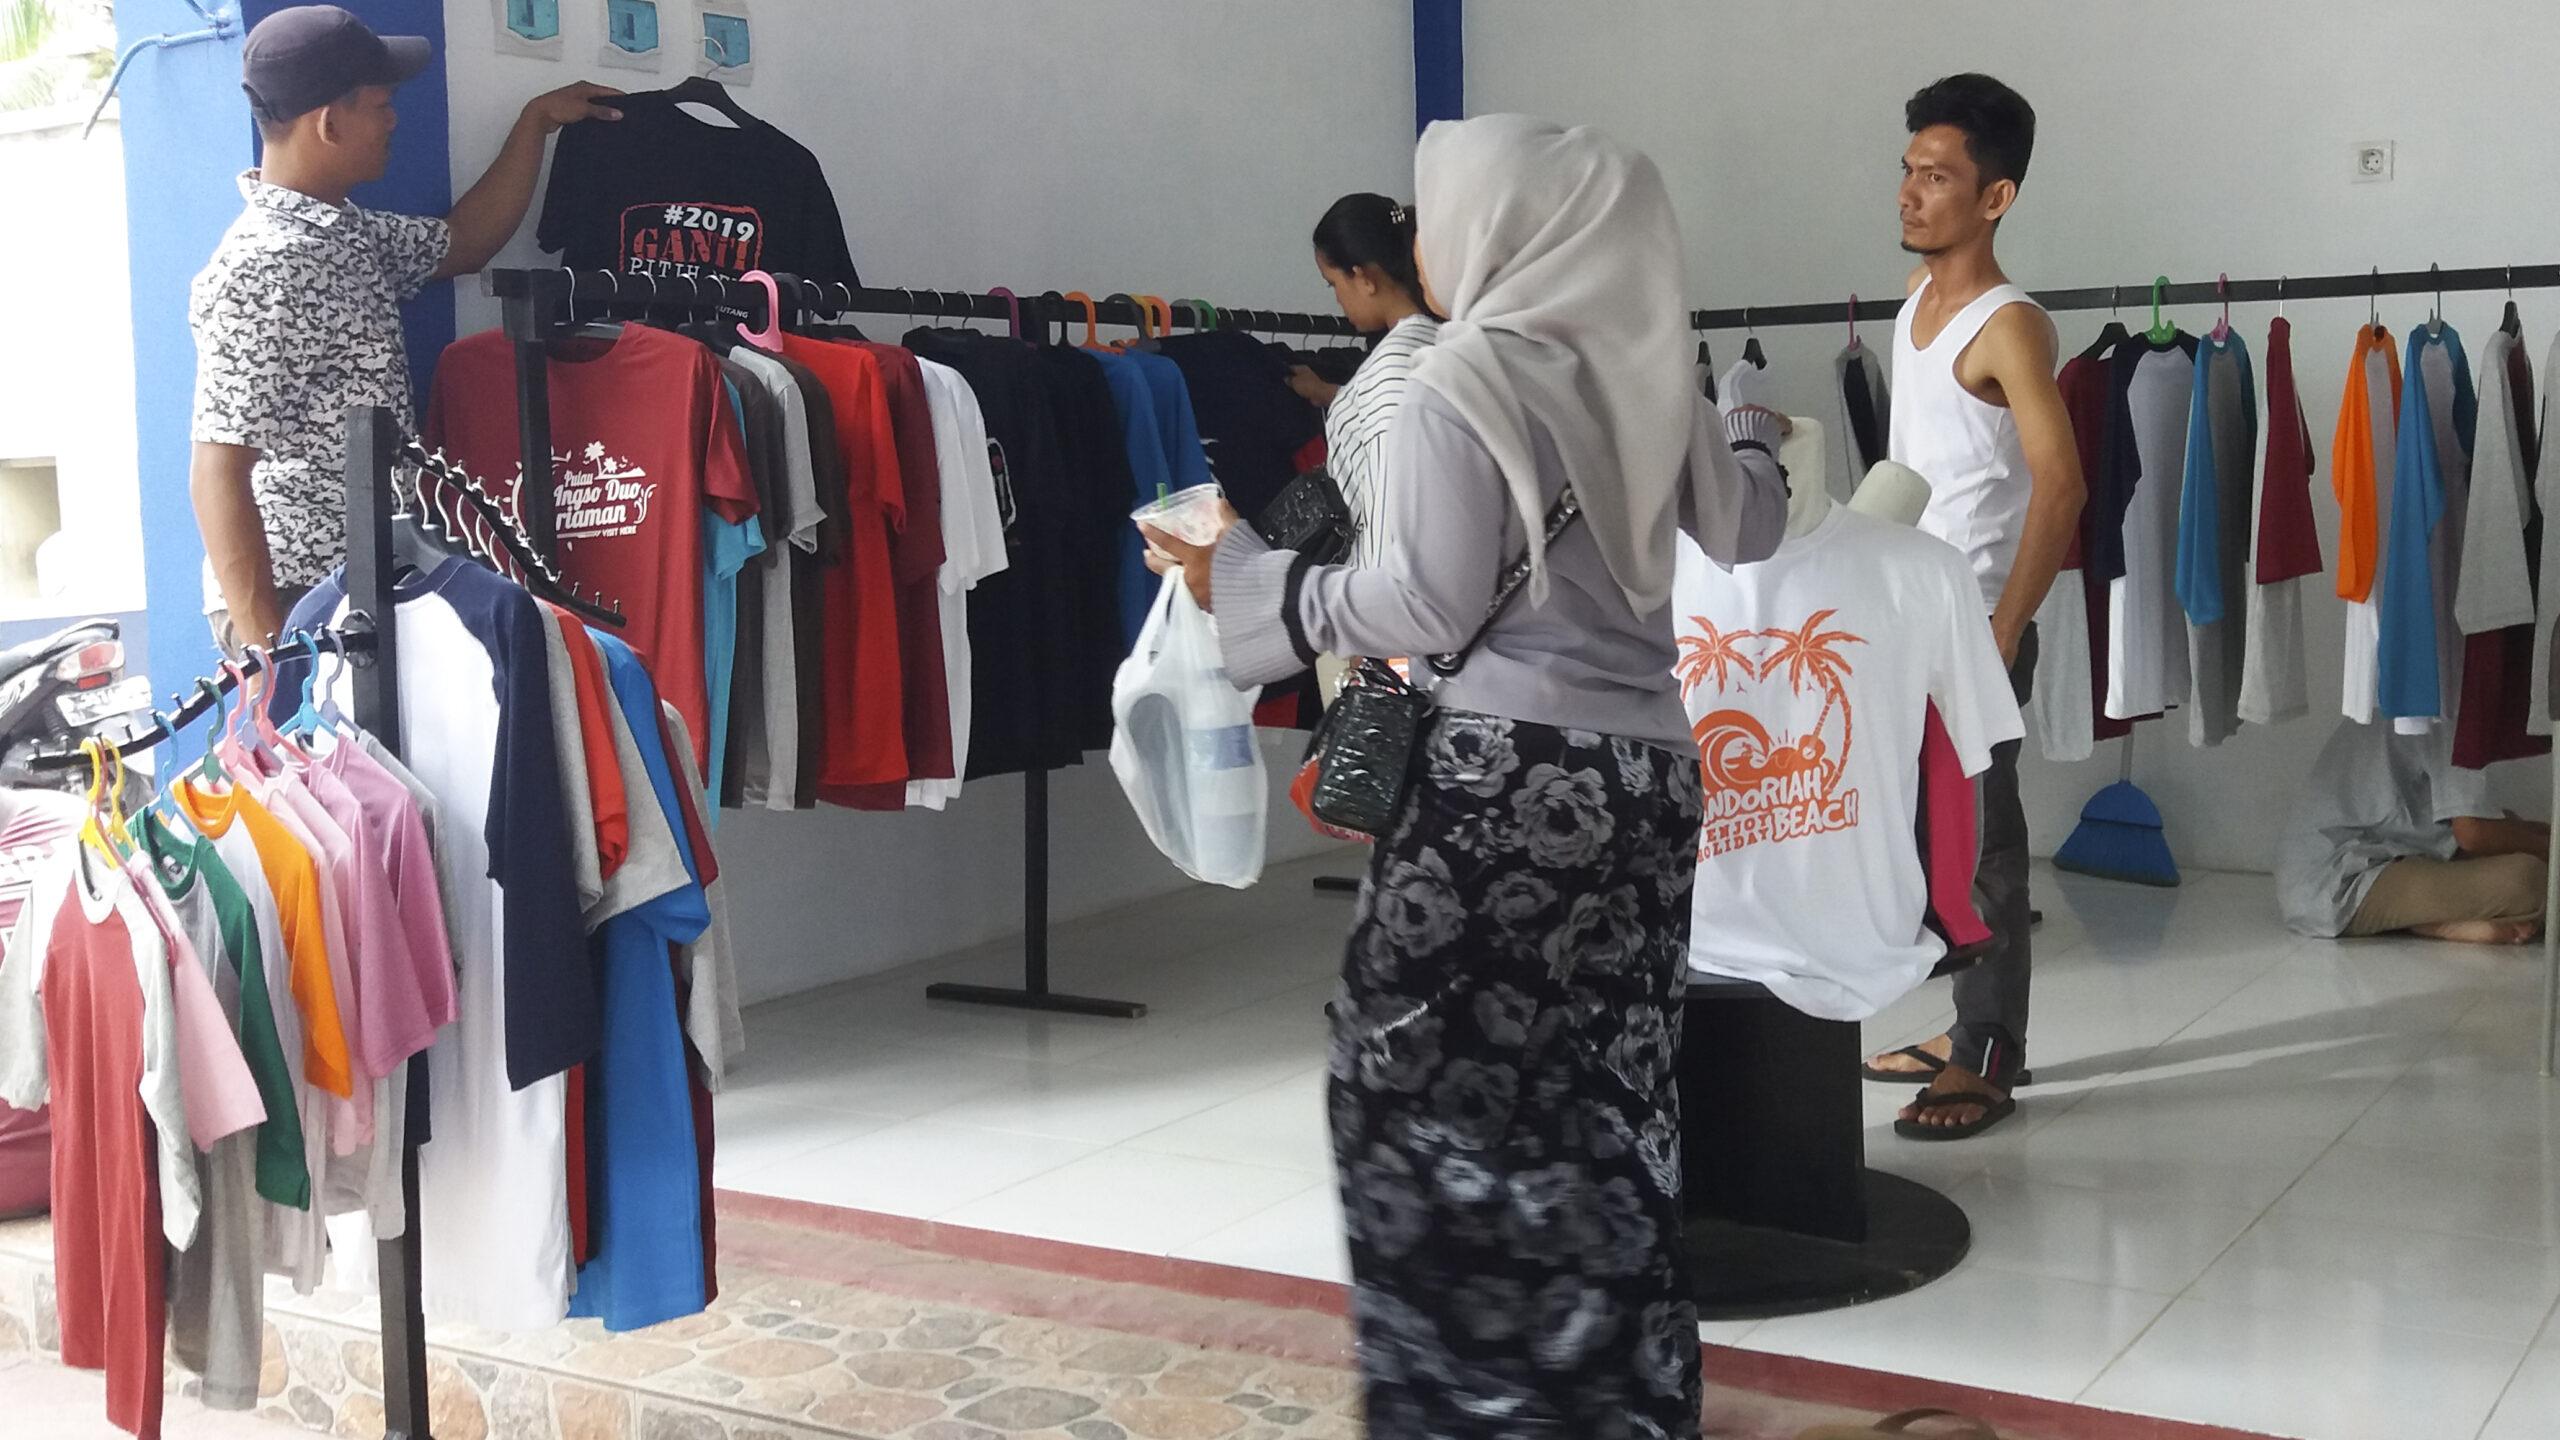 Kios Kaos di Syamratulangi, Kampung Baru Pariaman Tengah, Kota Pariaman, Selasa (19/6/2018).